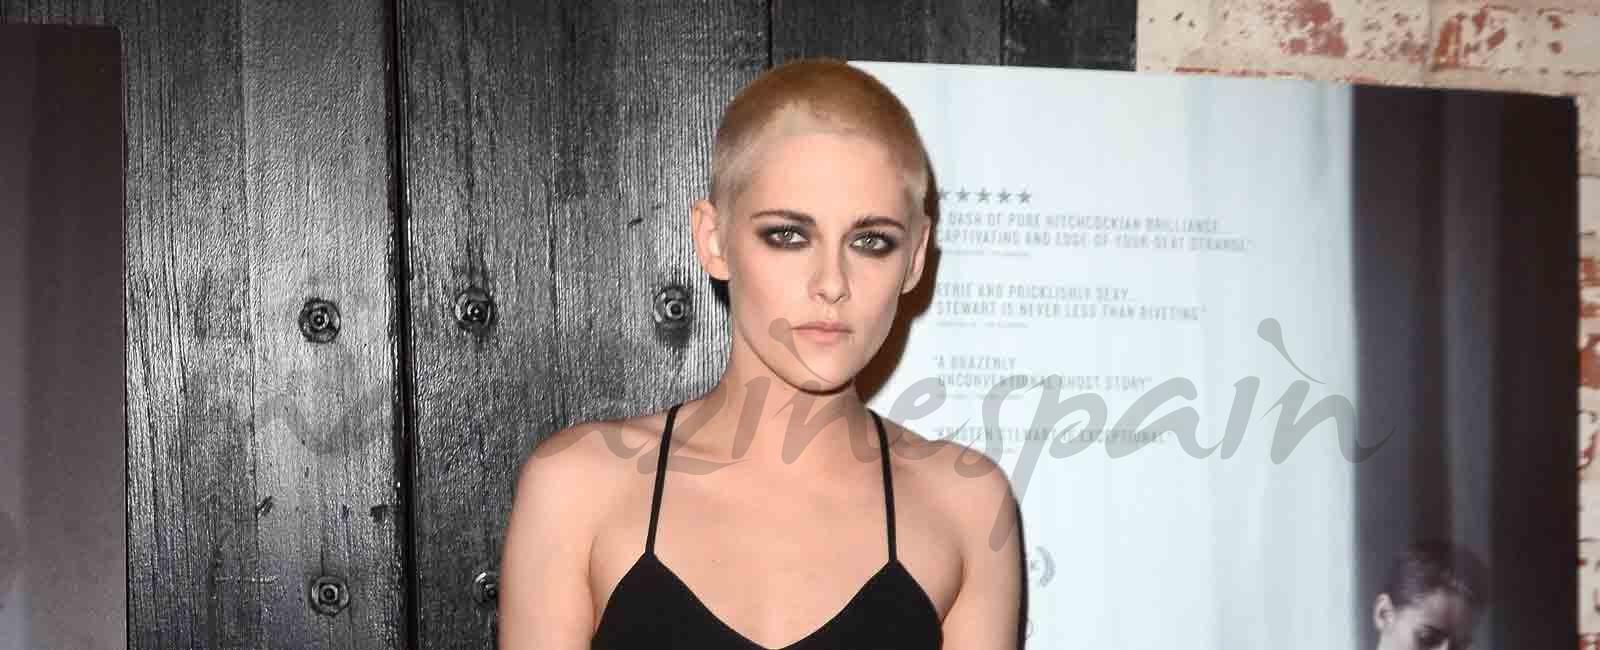 La nueva imagen de Kristen Stewart